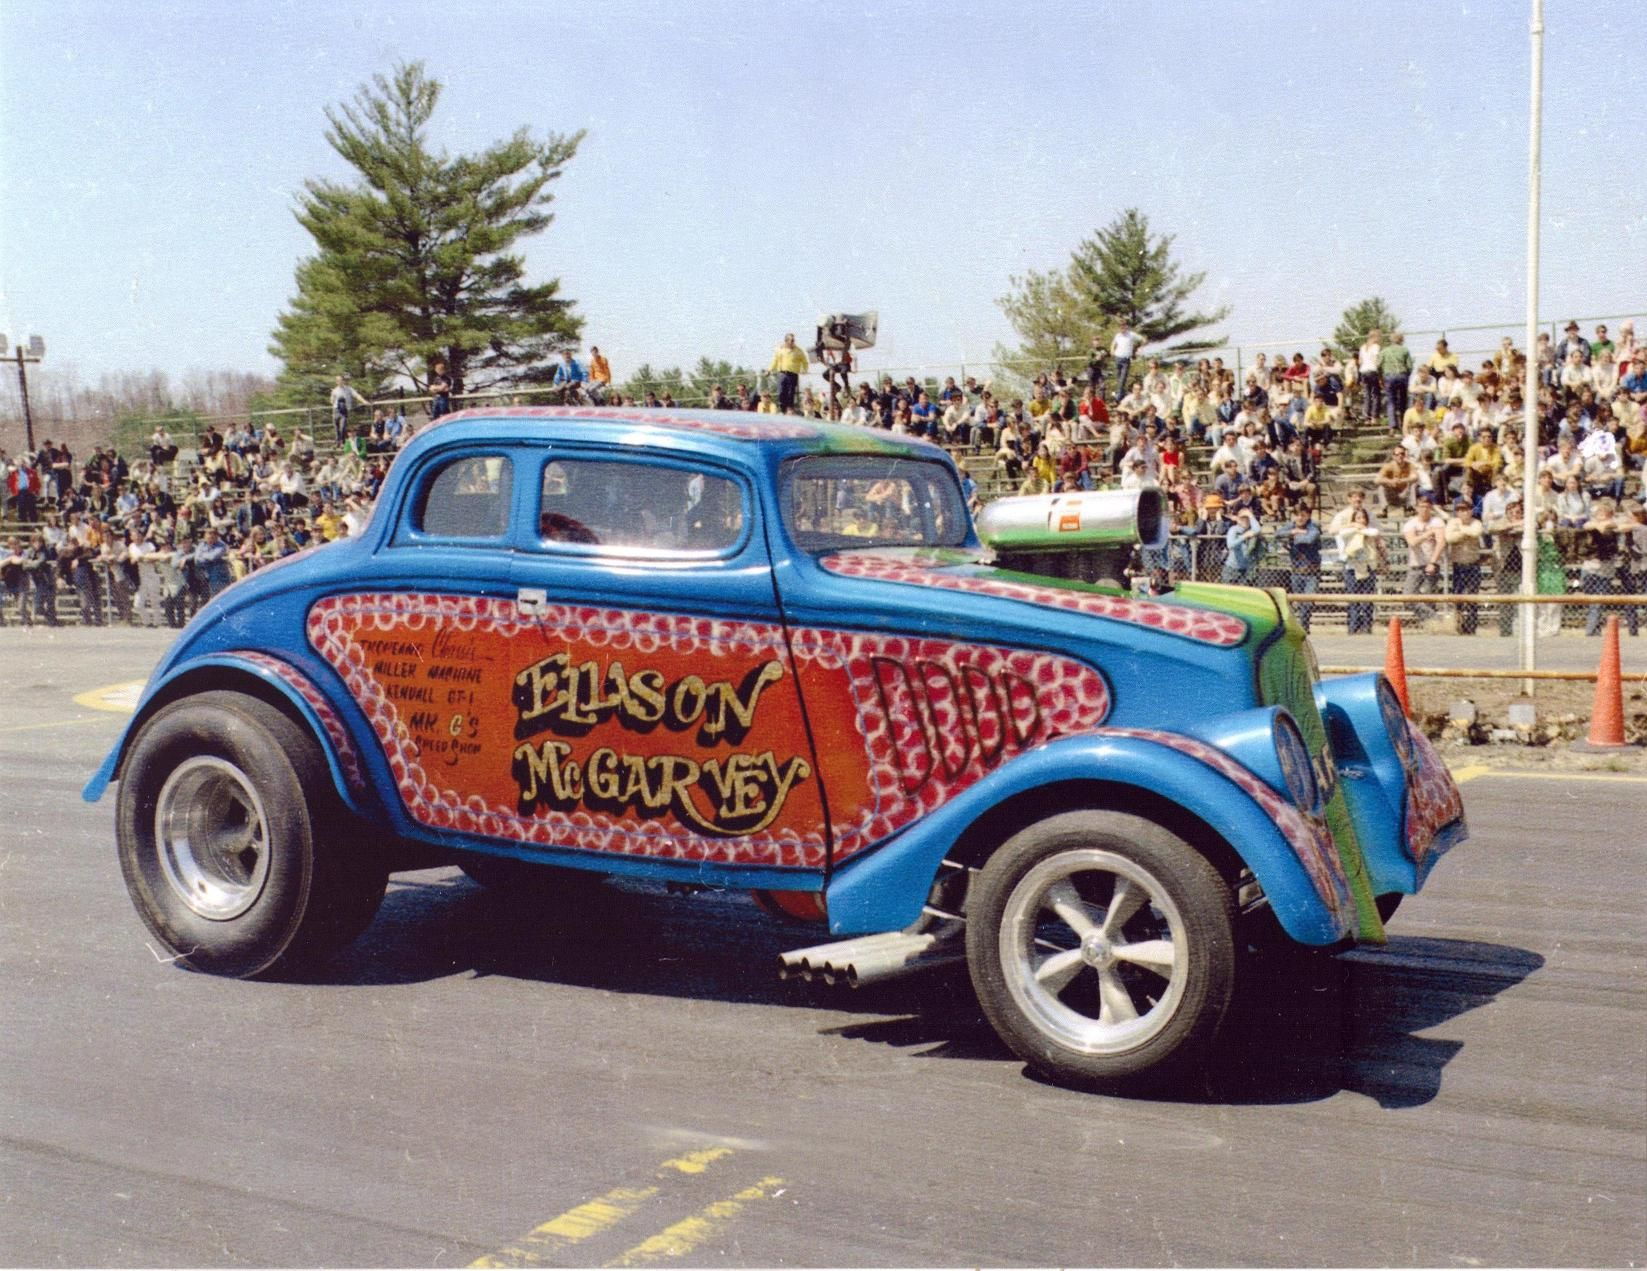 33 Willys Gasser Ellison Mcgarvey Classic Cars Vintage Willys Drag Racing Cars